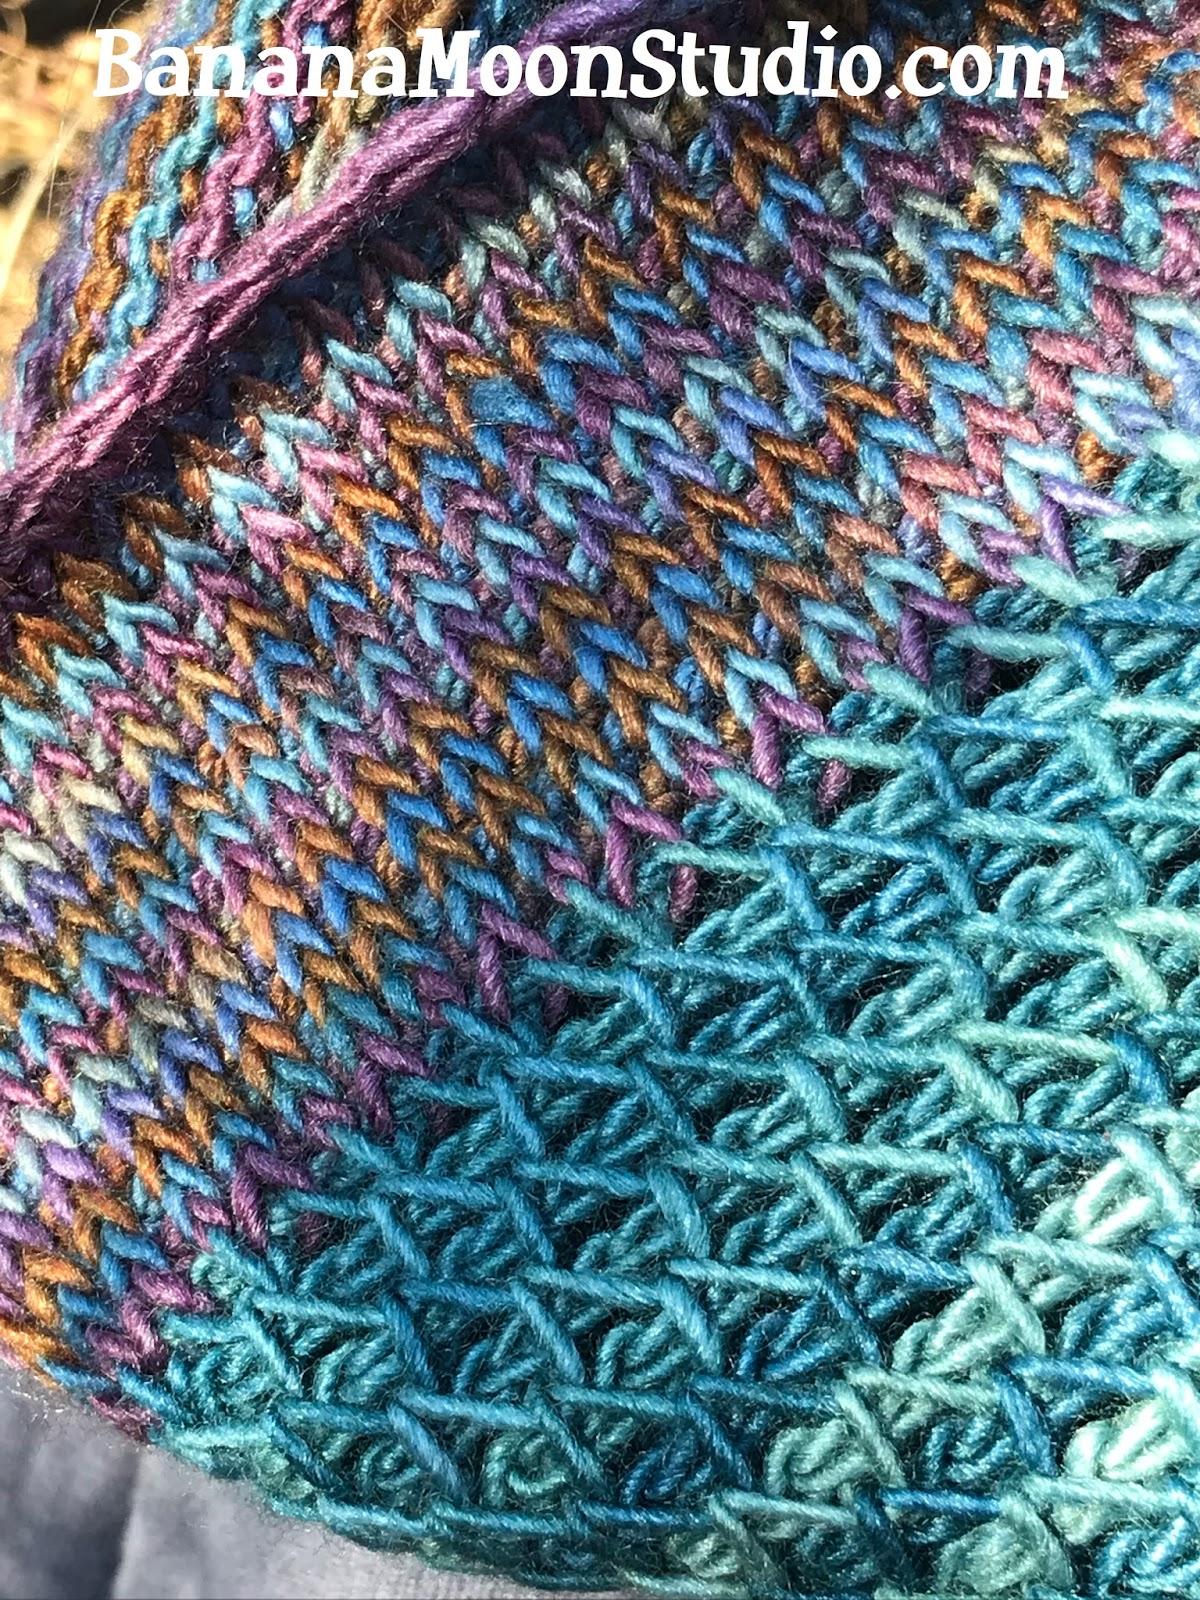 Tunisian Crochet Cowl Free Pattern Featuring Tunisian Smock Stitch